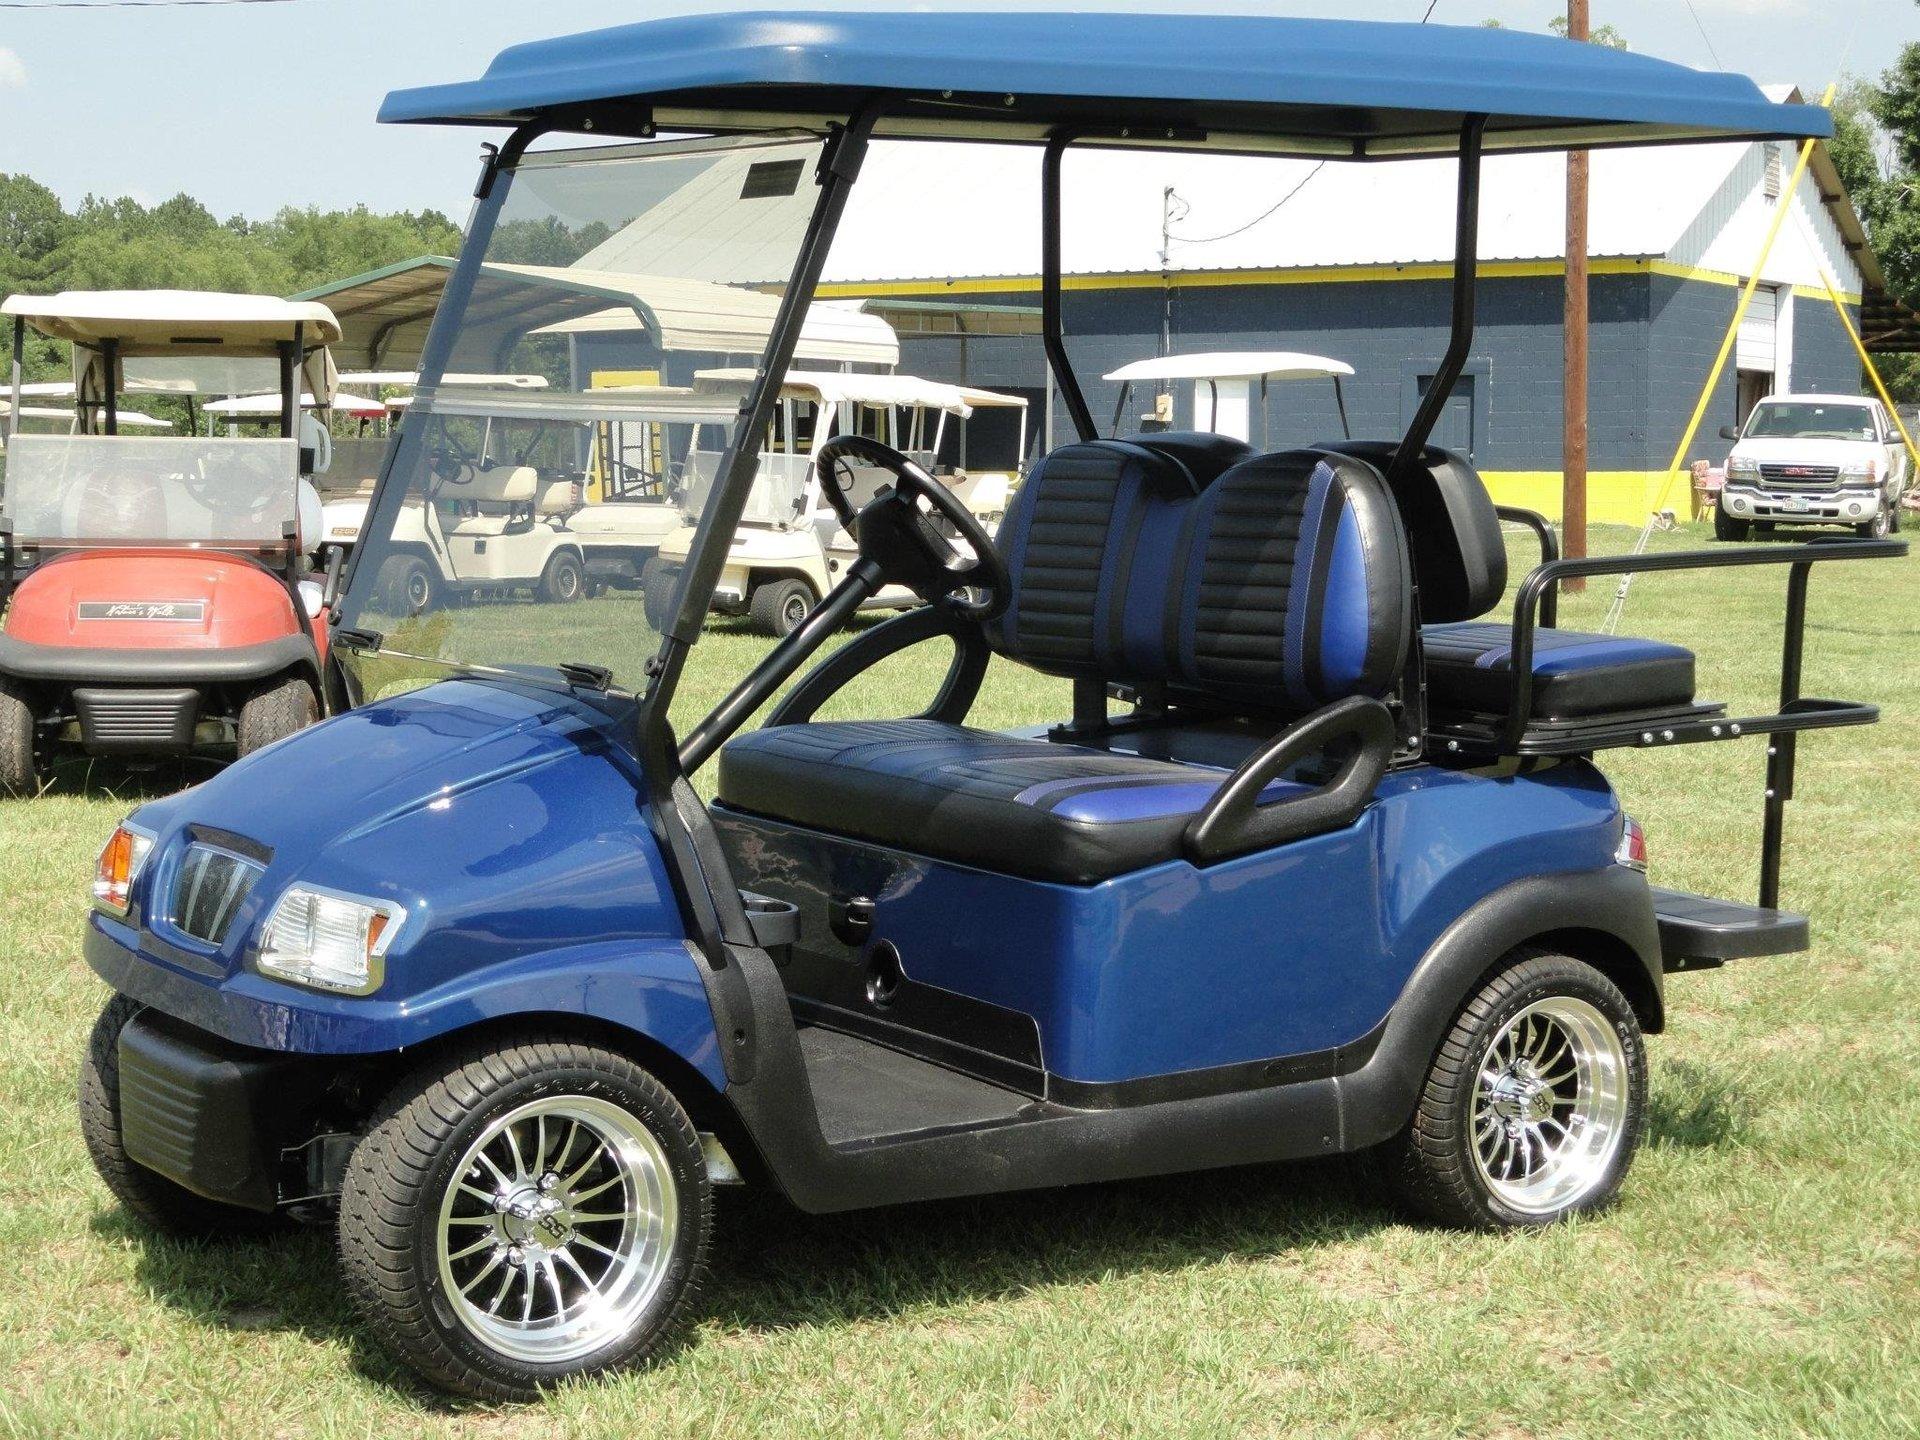 Golf Cart Kits | Custom Kits | Hawkins, TX Golf Cart Bos Kits on club cart lift kits, trailer kits, air compressor kits, go cart light kits, garden cart kits, bar stool cart kits, atv kits, construction kits, chopper kits, go cart lift kits, parts kits, hot tub kits, camper kits, log splitter kits, golf carts like trucks, golf carts vehicle, golf decorating ideas, dune buggy kits, golf pull carts clearance, wheel kits,